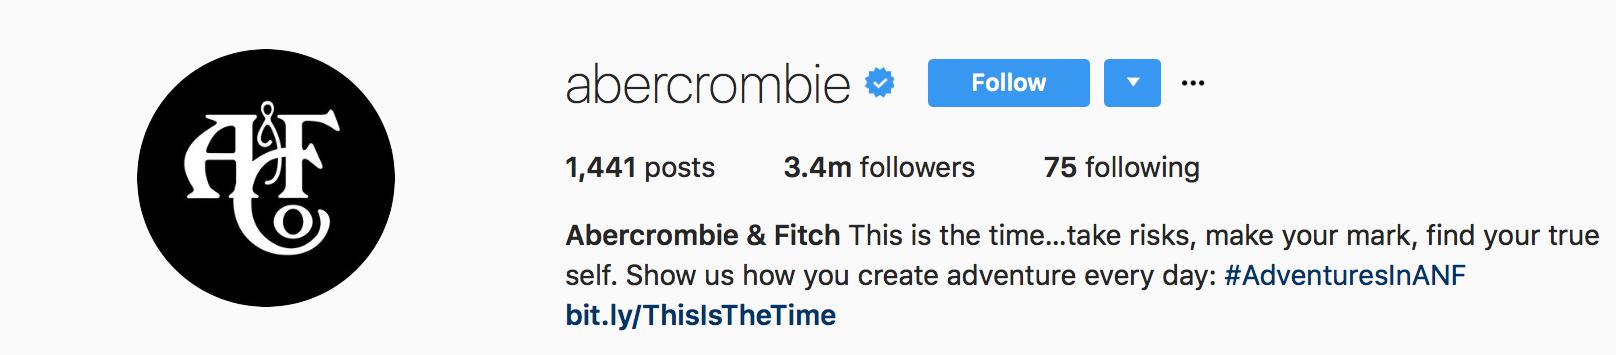 Abercrombie Instagram 2